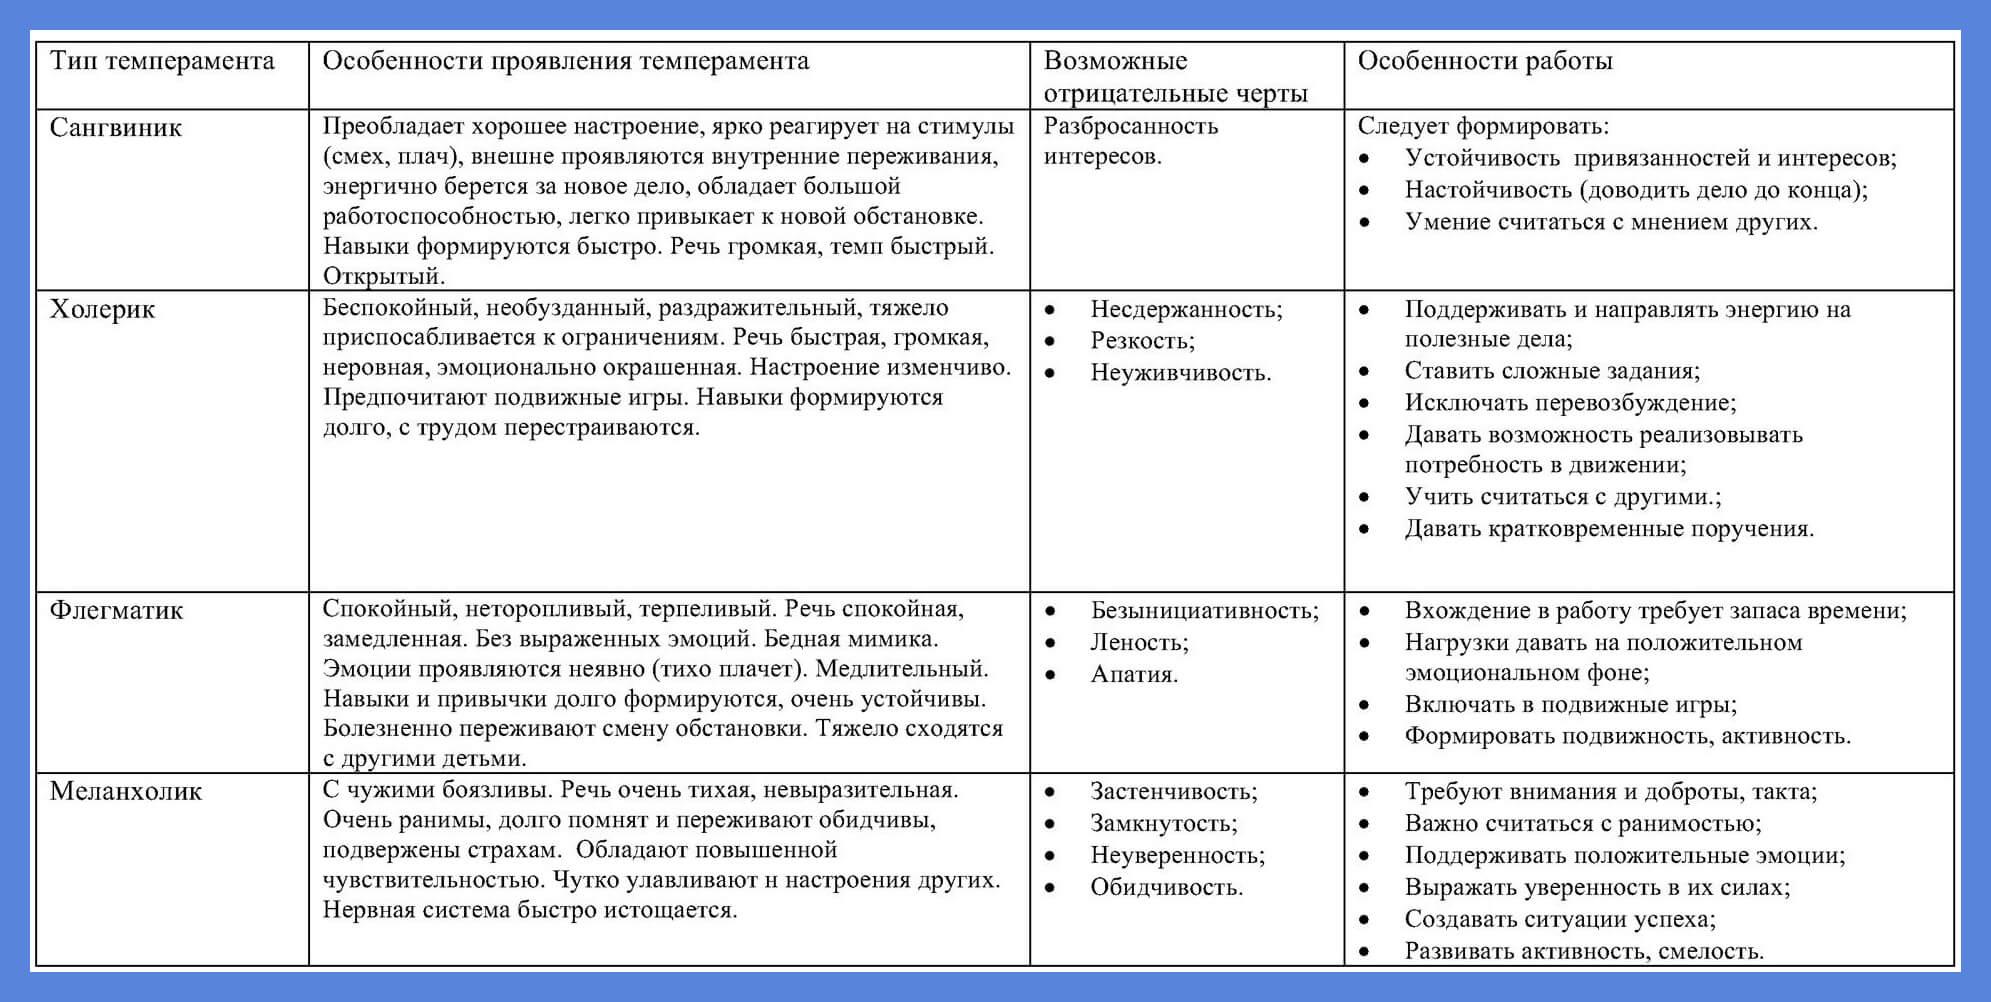 Характеристика типов темпераментов личности